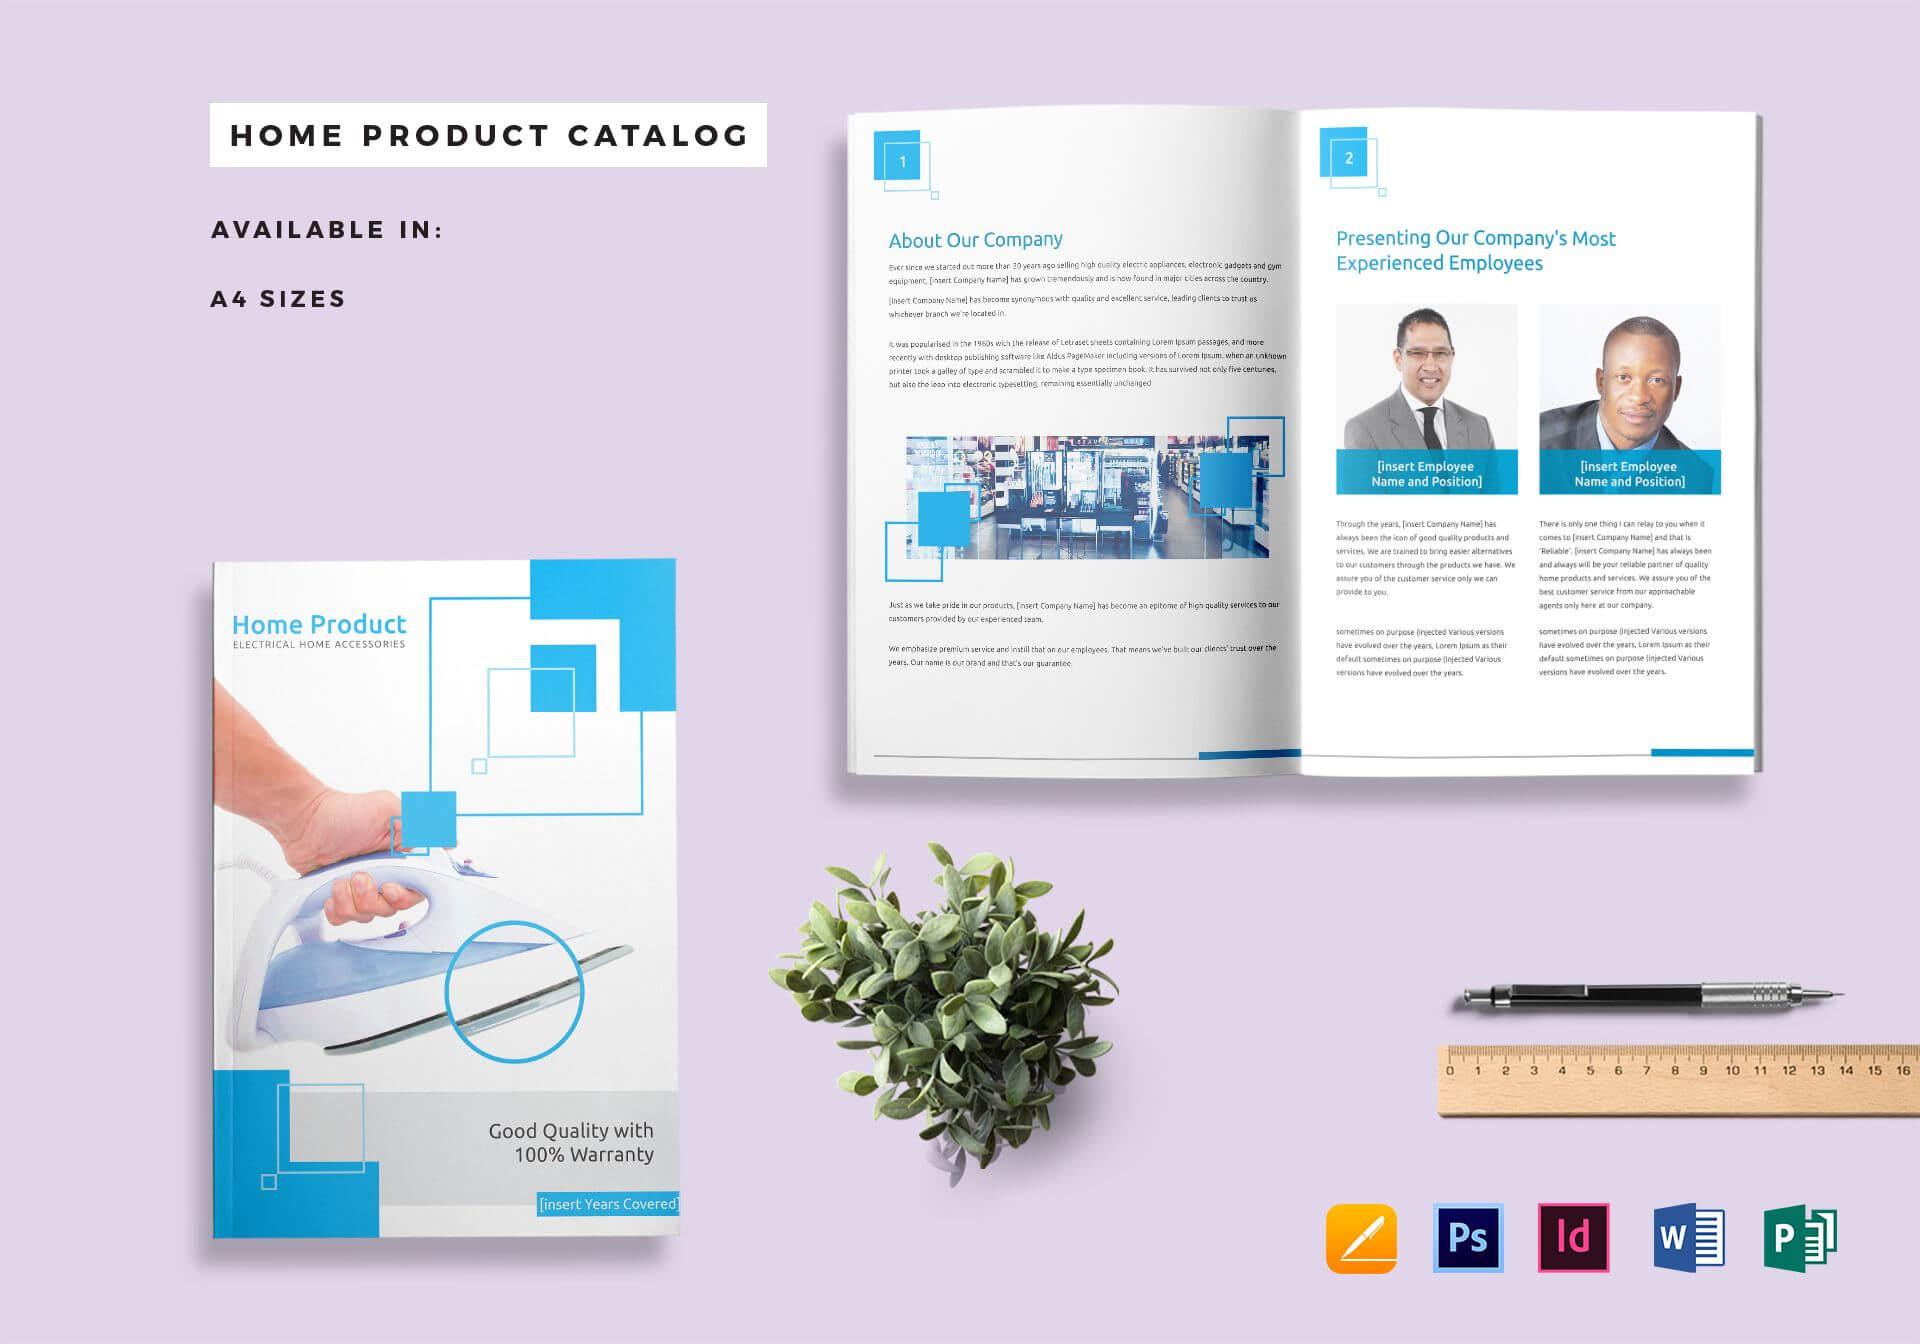 Home Product Catalog Template regarding Word Catalogue Template